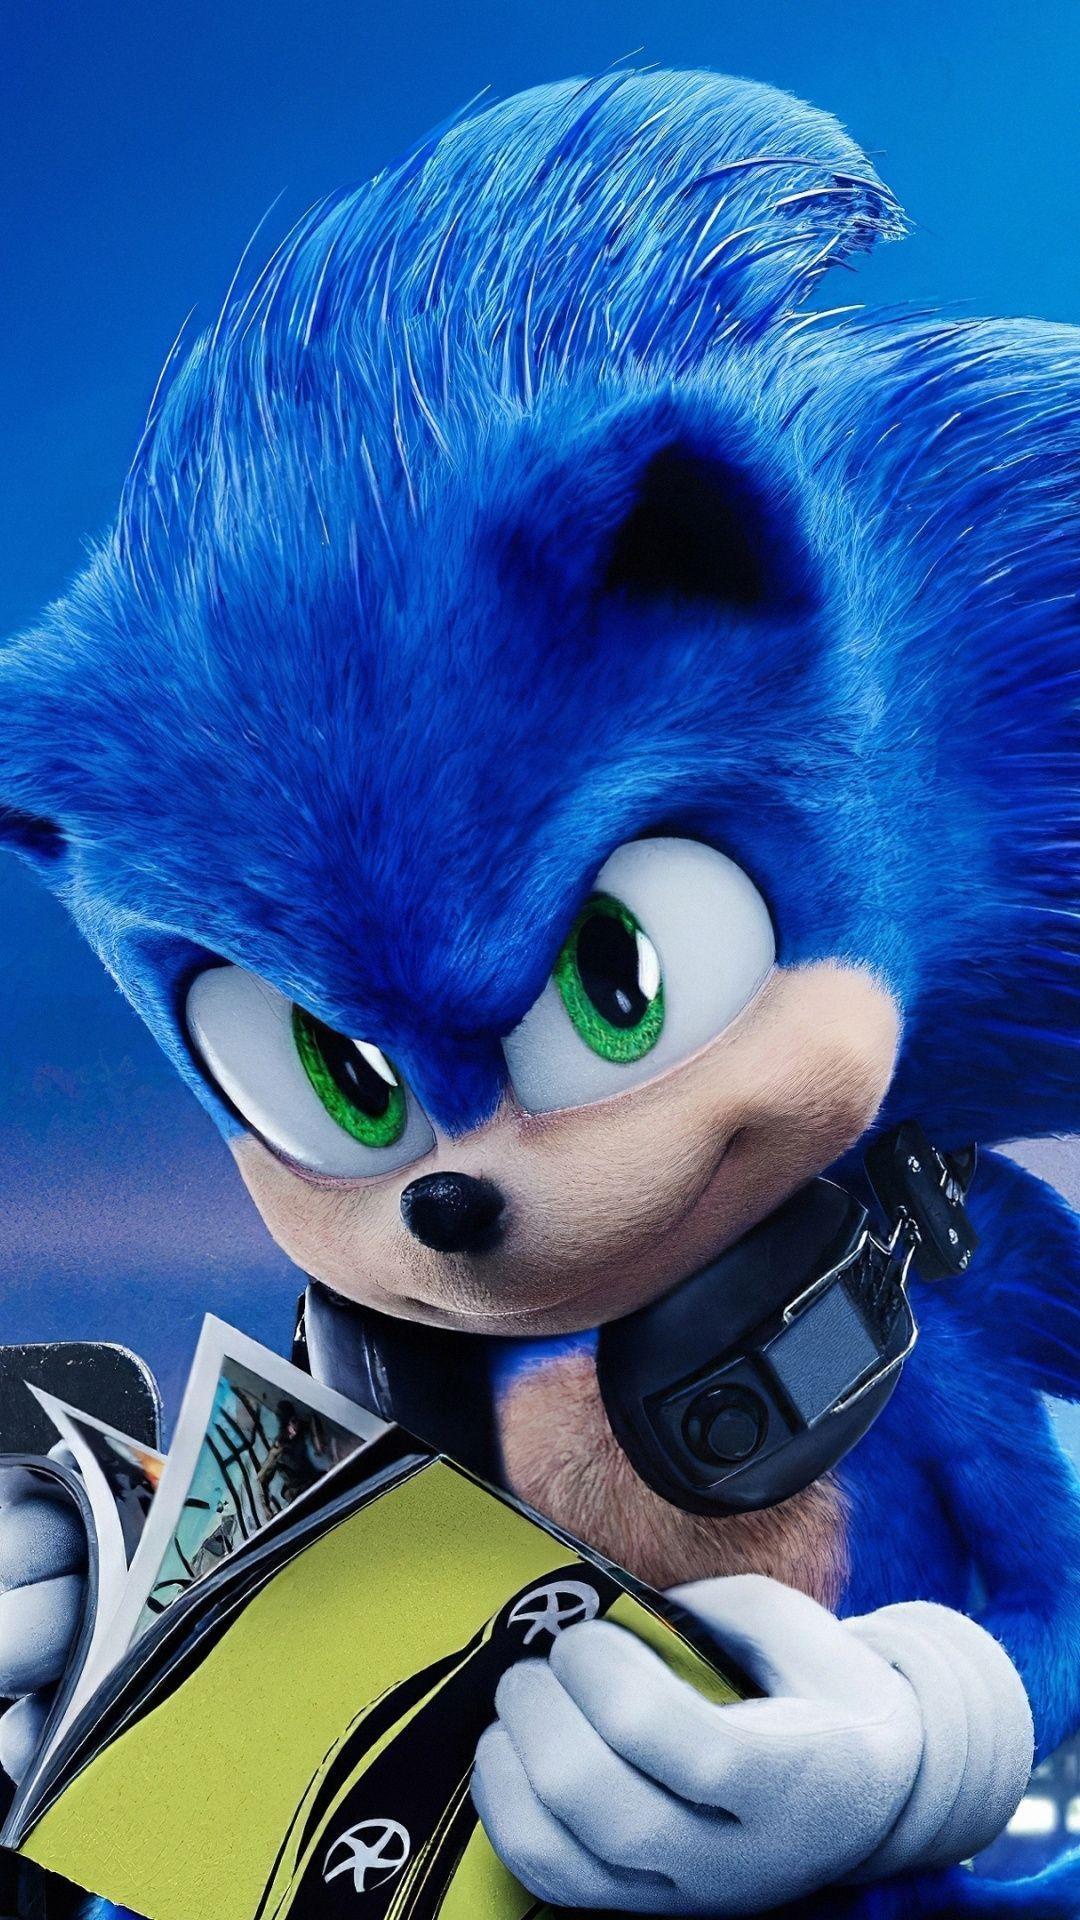 10801920 Sonic The Hedgehog 2020 Movie Wallpaper 4k 10801920 Sonic The Hedgehog 2020 Movie Wallpaper 4kestas En El Lugar Co In 2020 Hedgehog Movie Hedgehog Art Sonic